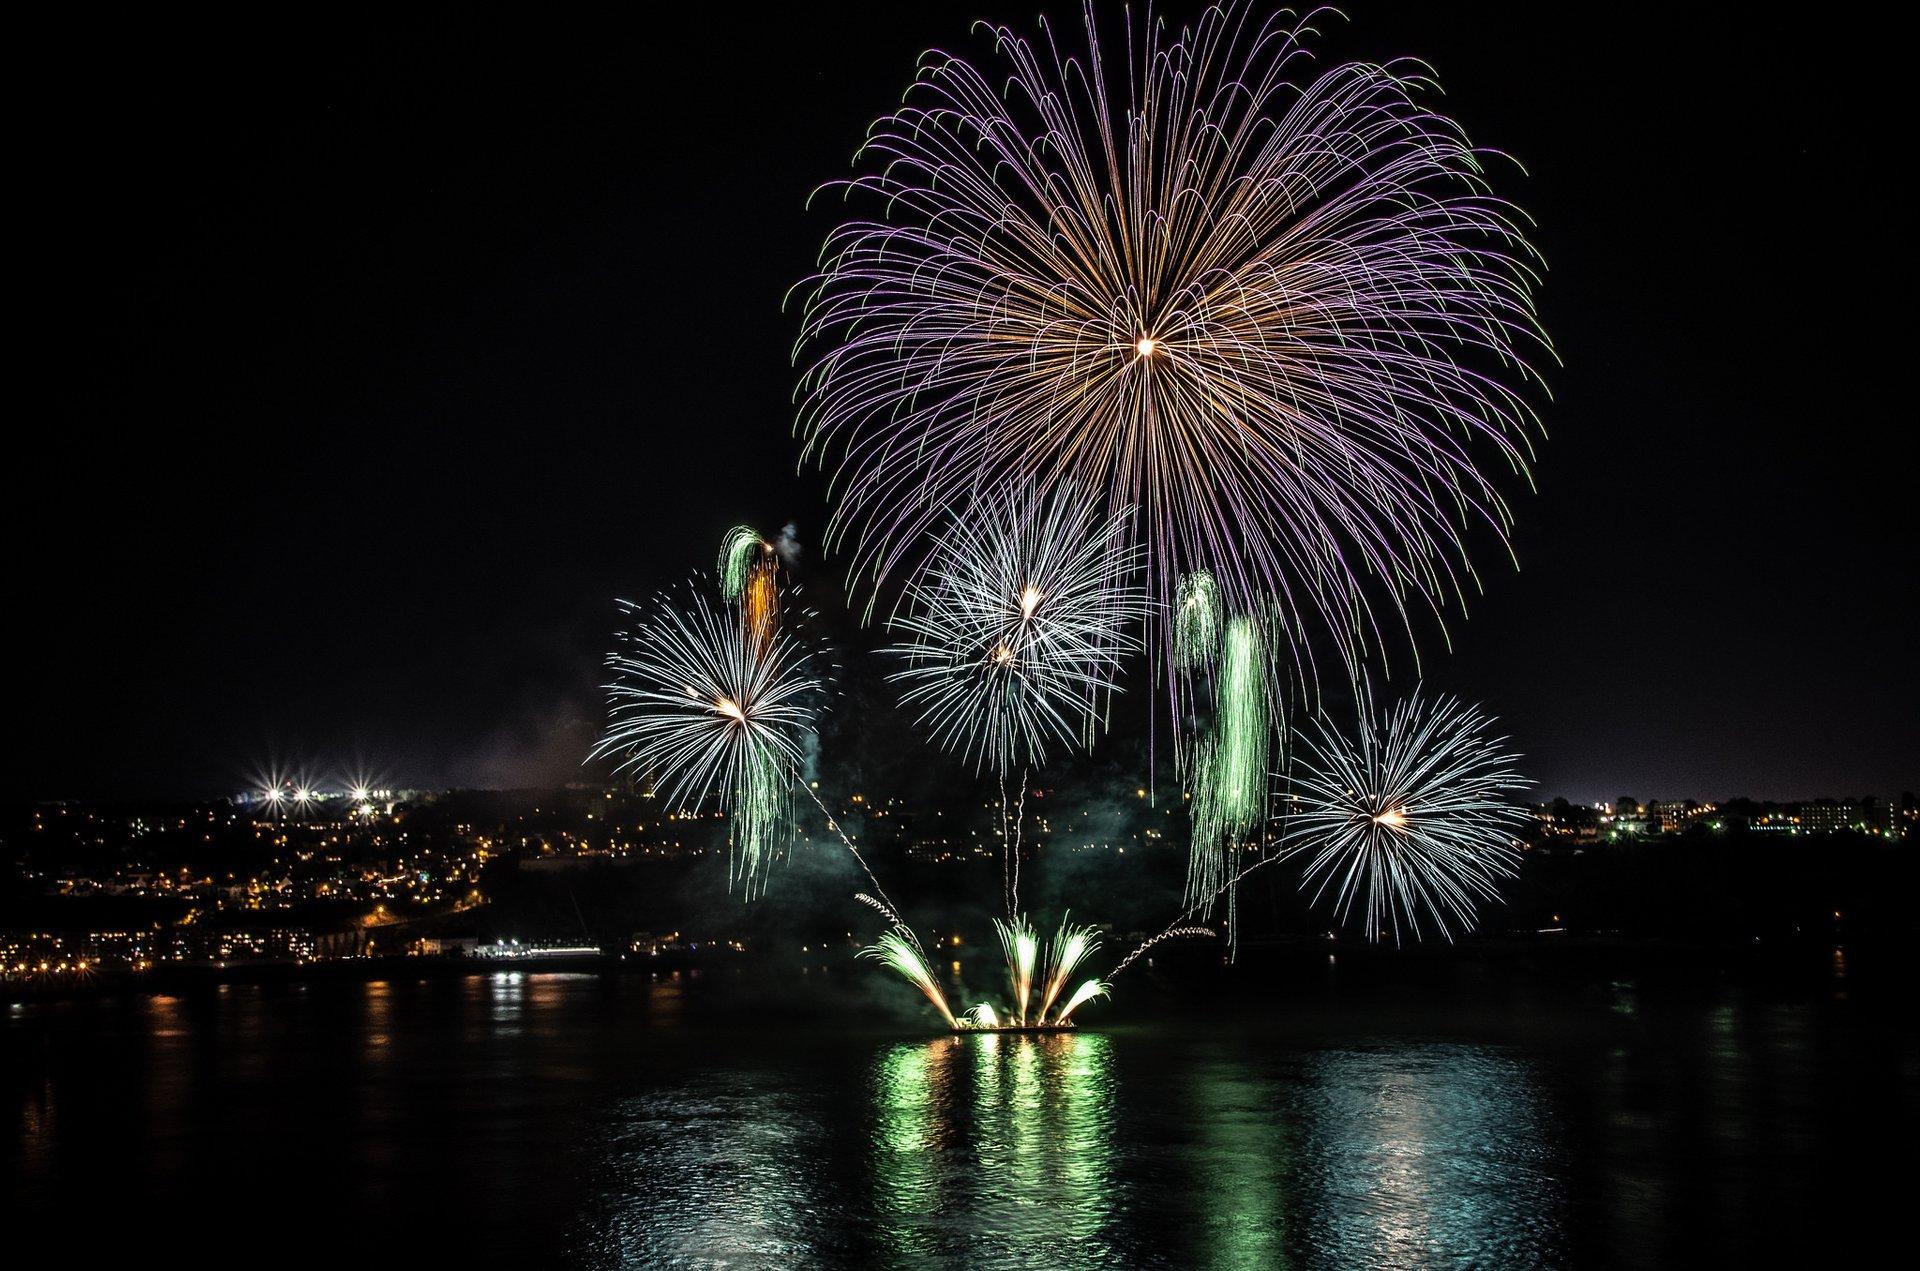 Les Grands Feux Loto-Québec (Fireworks Festival) in Quebec - Best Season 2020